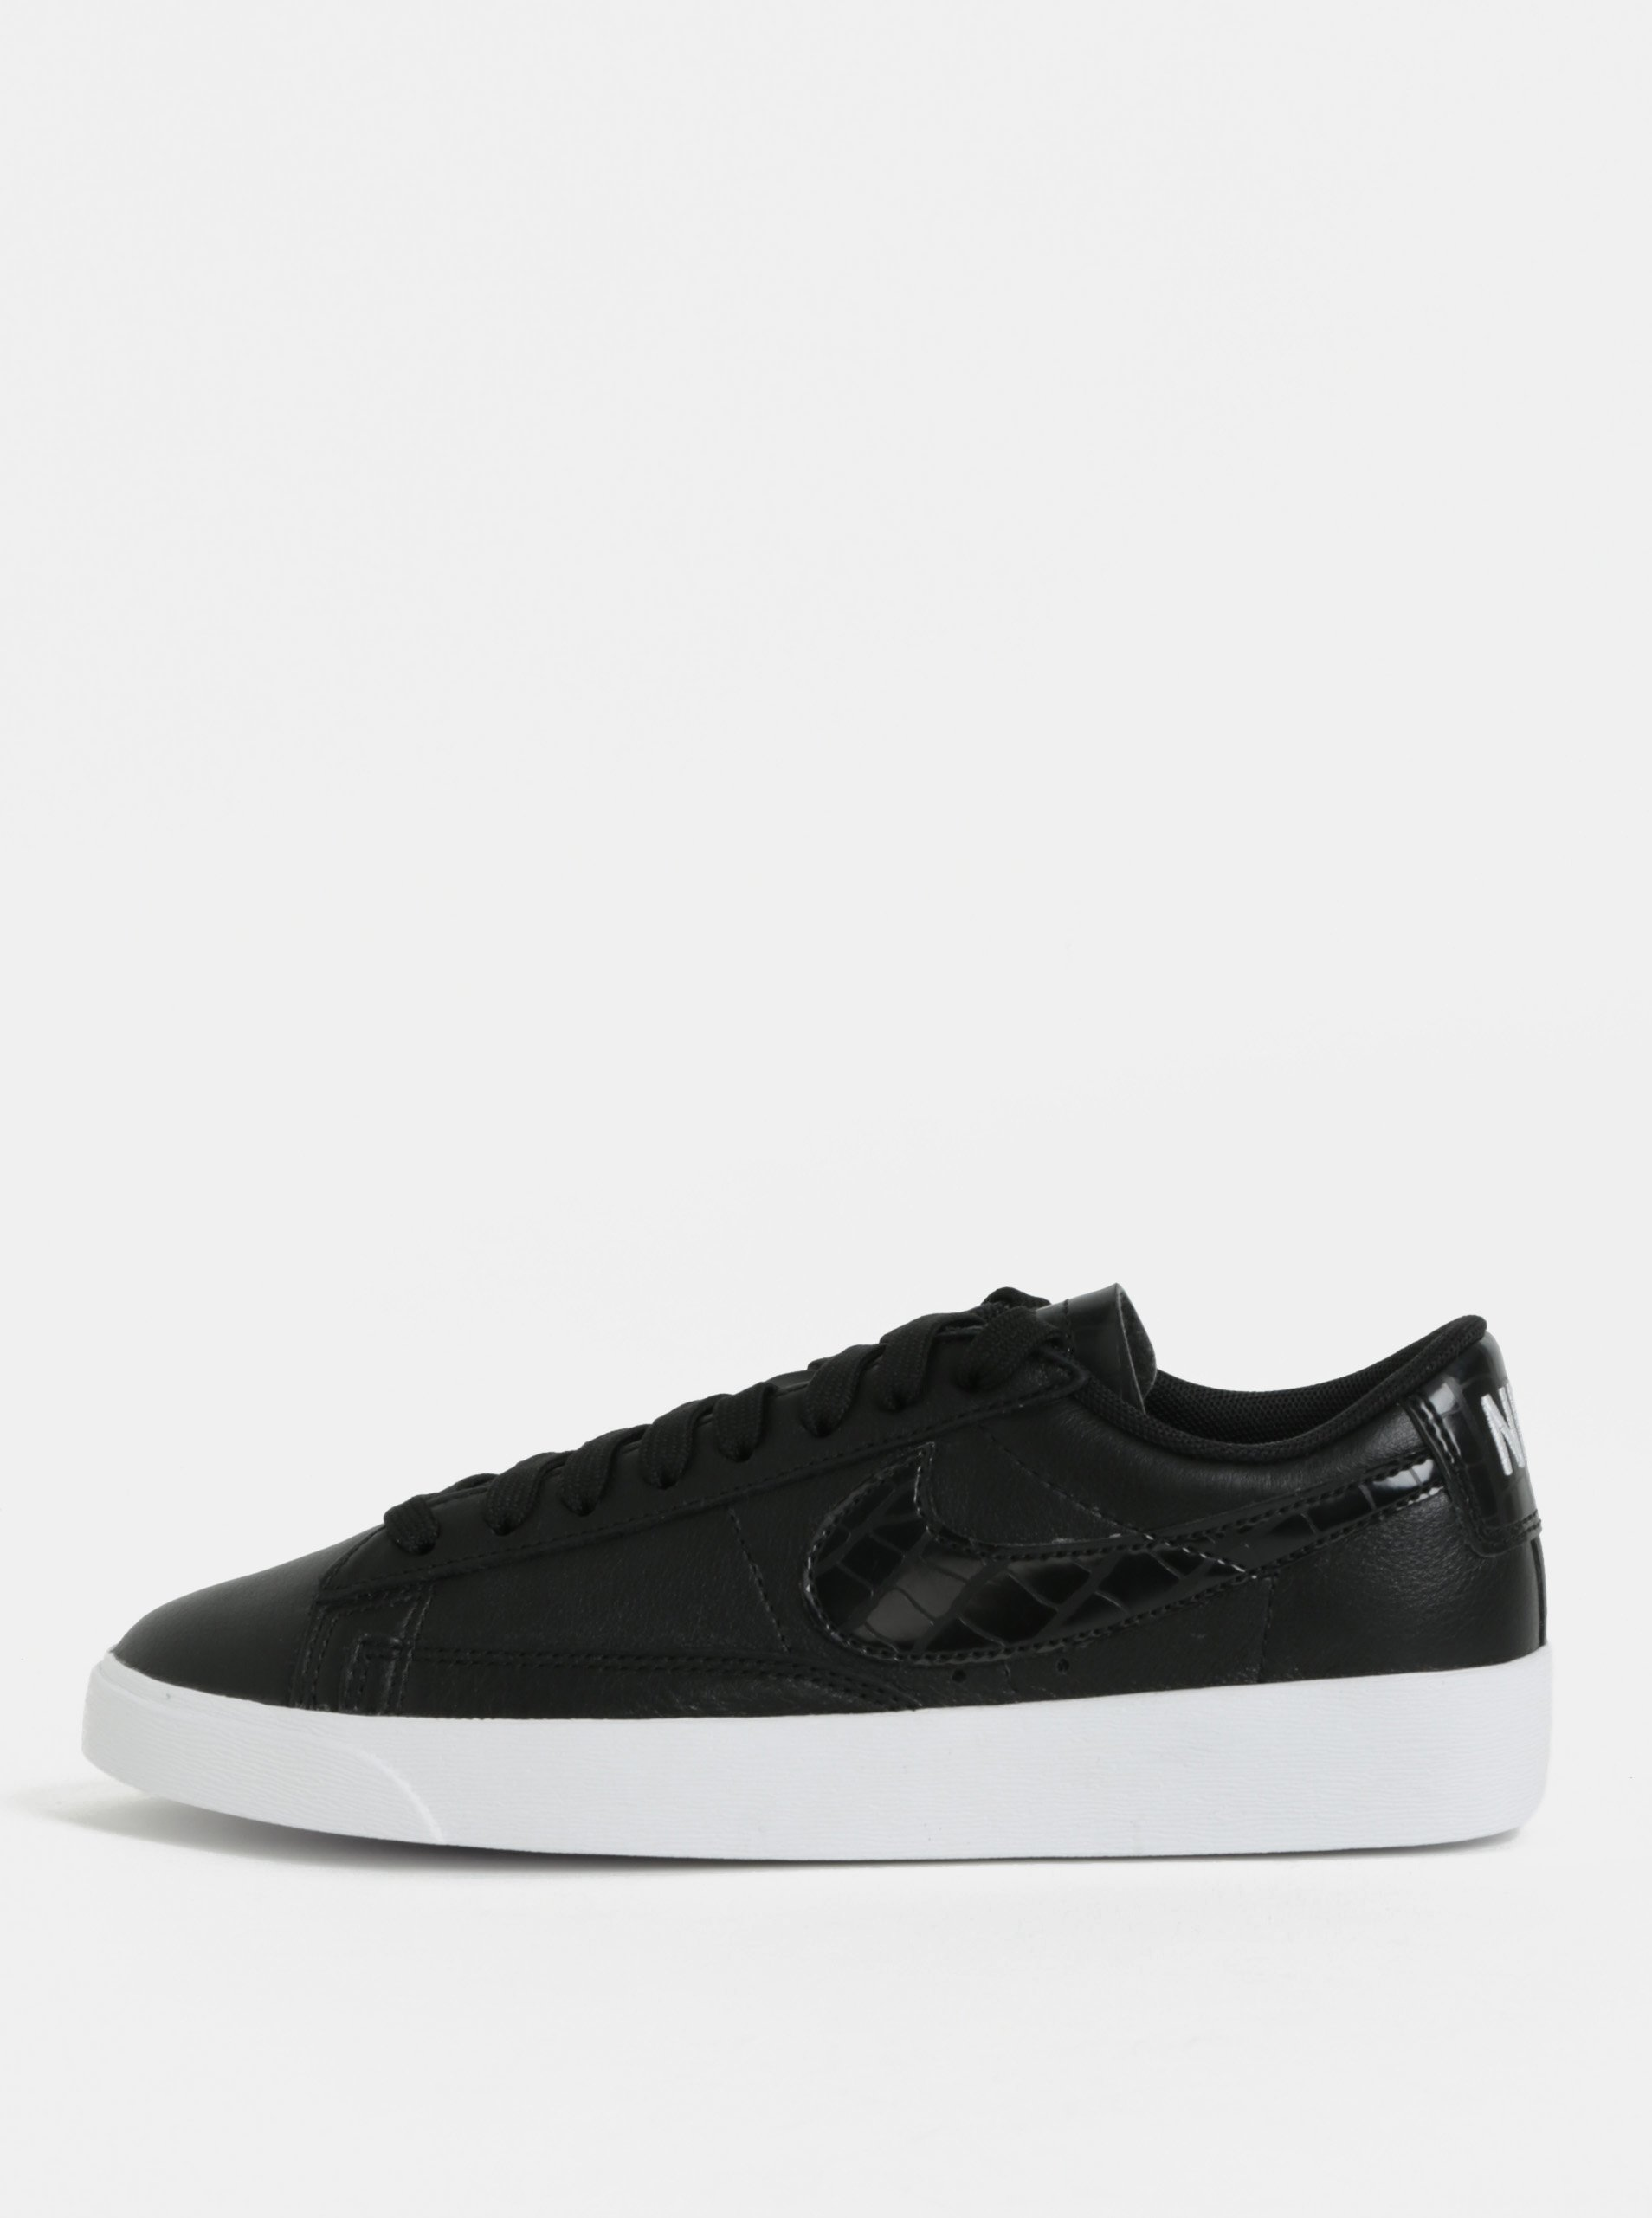 Čierne dámske kožené tenisky Nike Blazer Low Leather